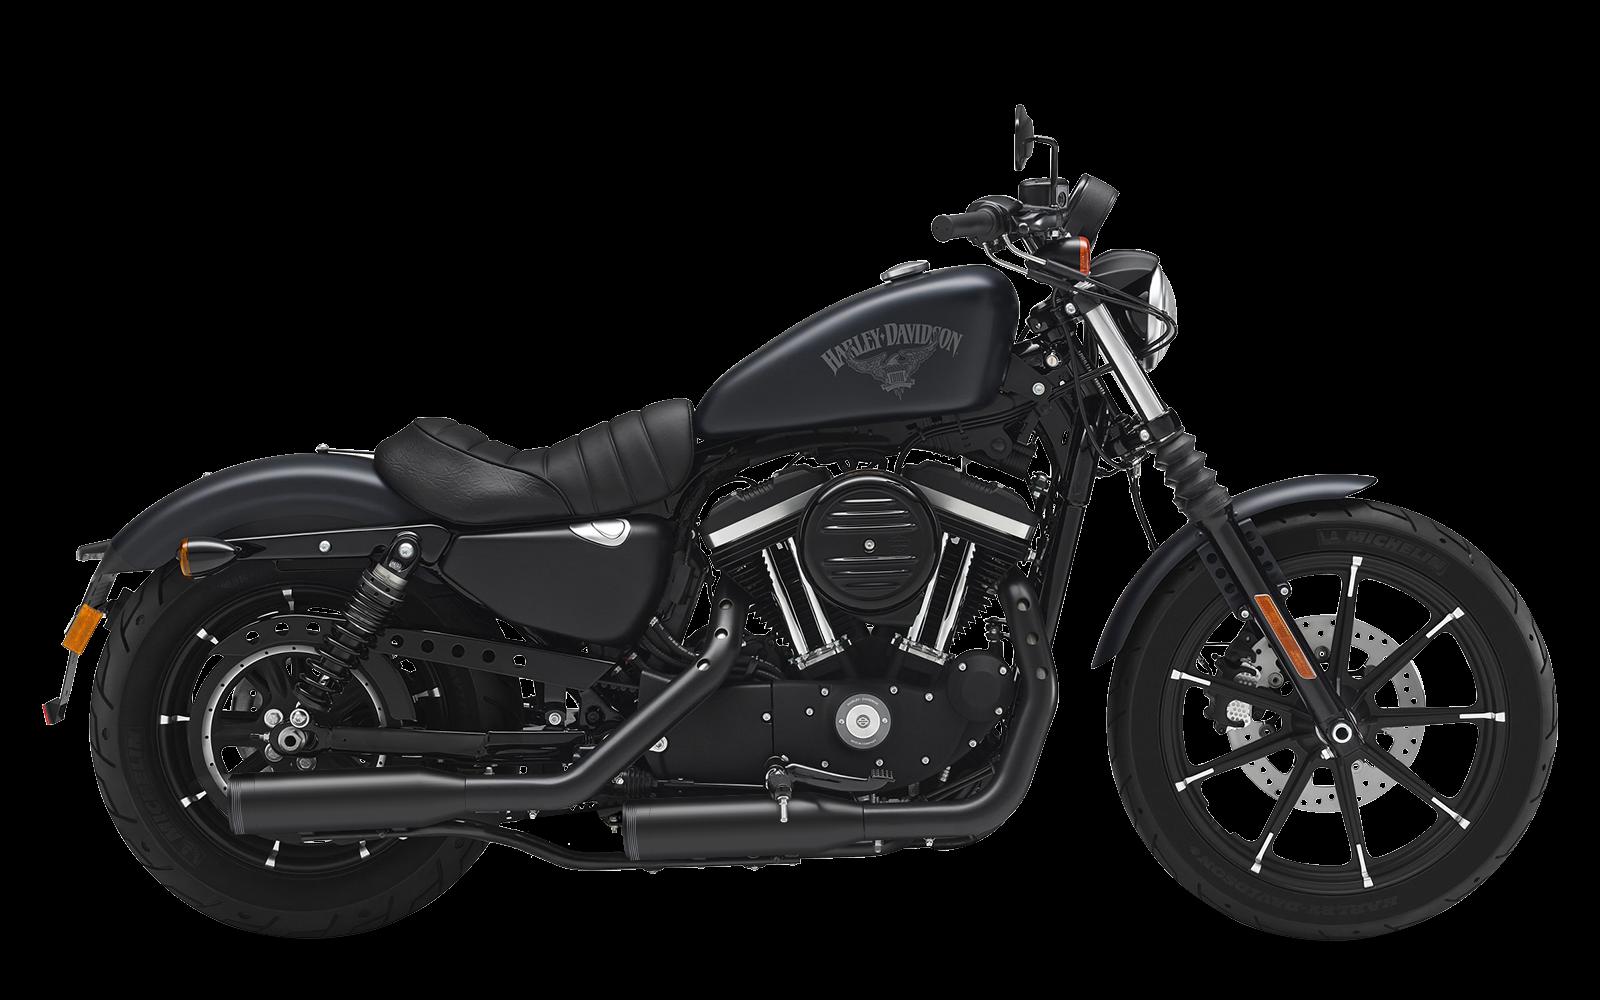 Sportster - Iron 883 - XL - 2017-2020 - Slipons adjustable